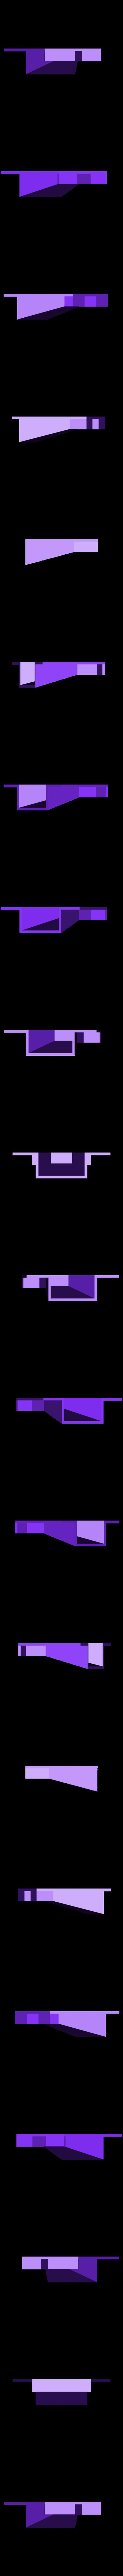 dragon_teeh_mold-flange.STL Download free STL file  Concrete obstacles • 3D printable model, Steyrc